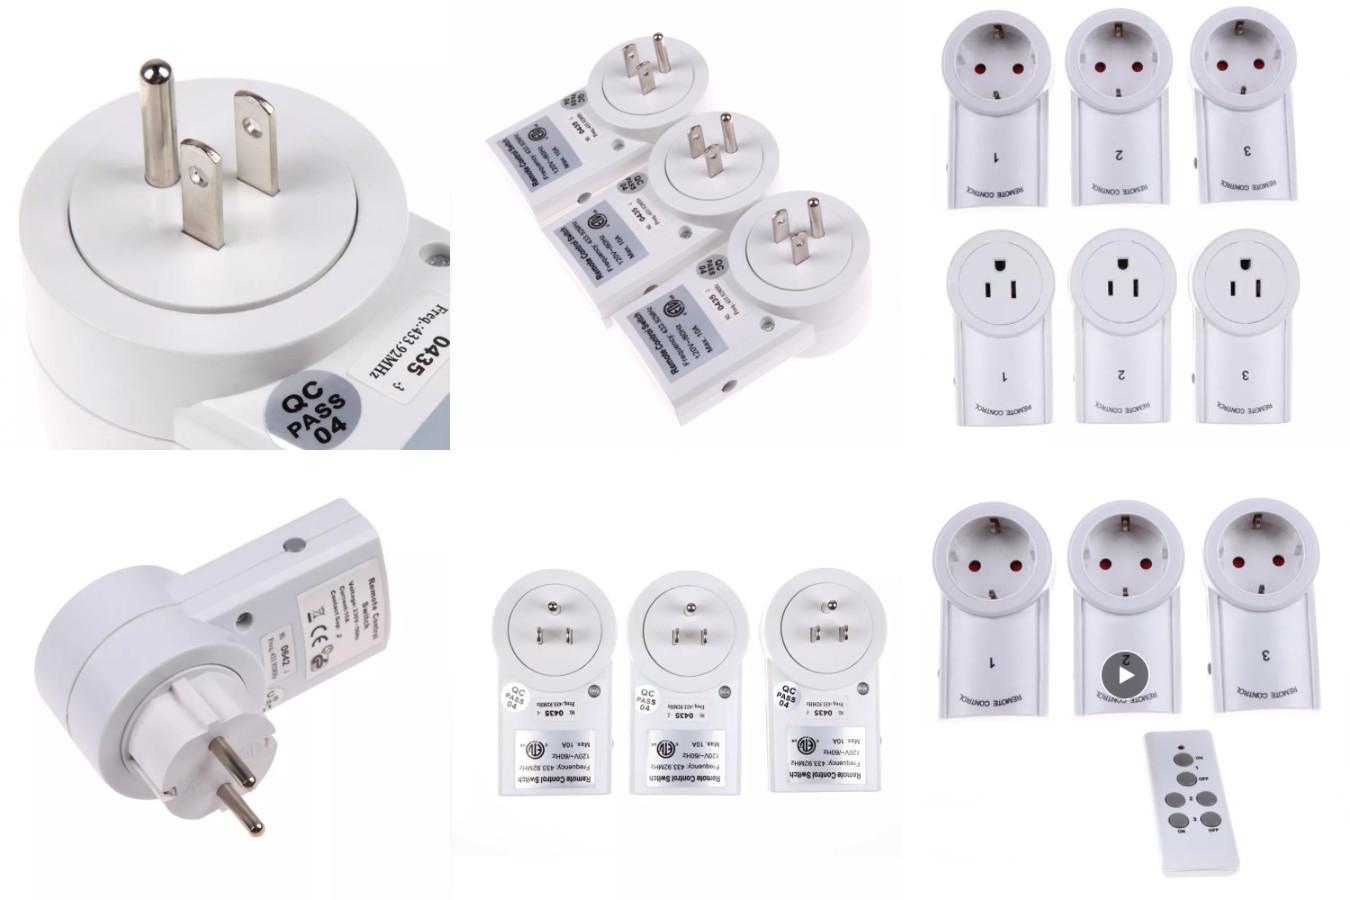 Розетка с пультом ДУ — ALLOYSEED Wireless Switch Socket